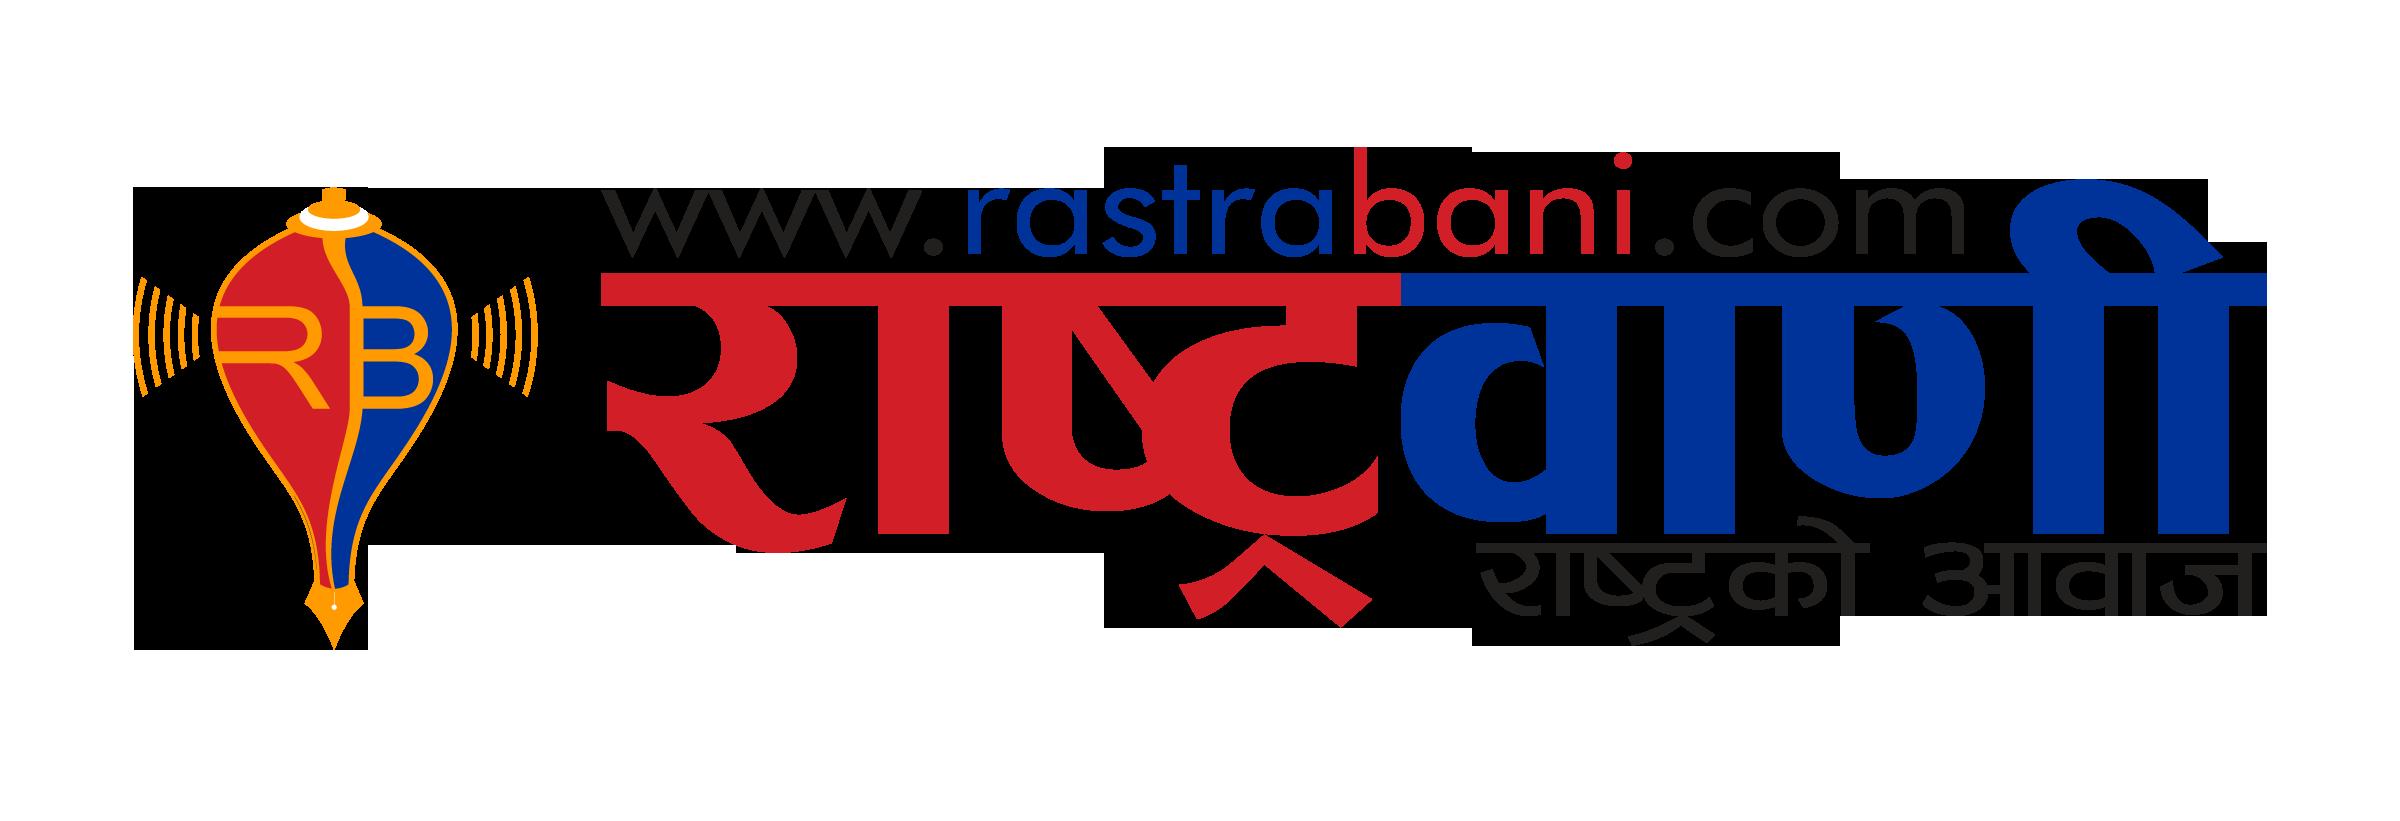 Rastrabani.com Logo